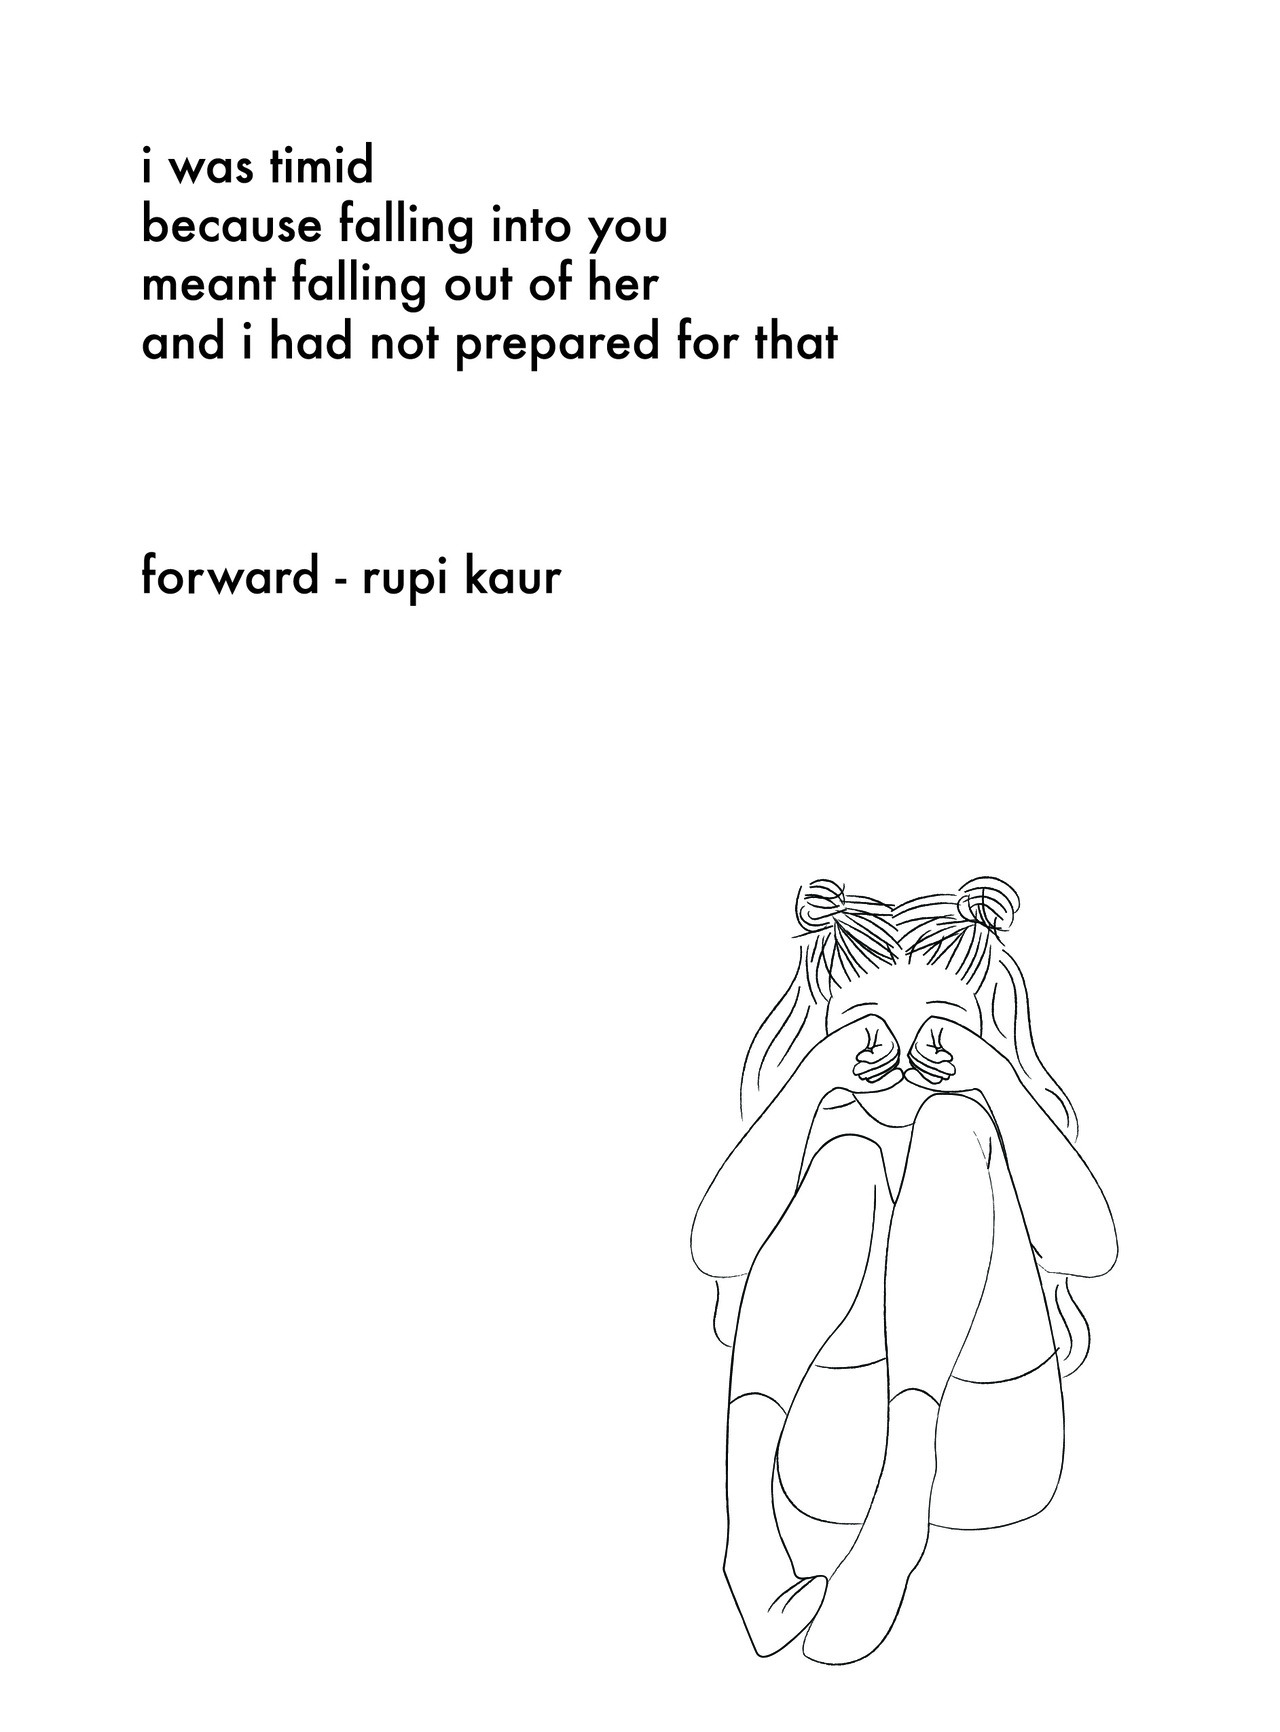 #timid#rupi kaur#sad#falling out#feelings#graphic design#illustration#poetry#depression#love#change#rendition